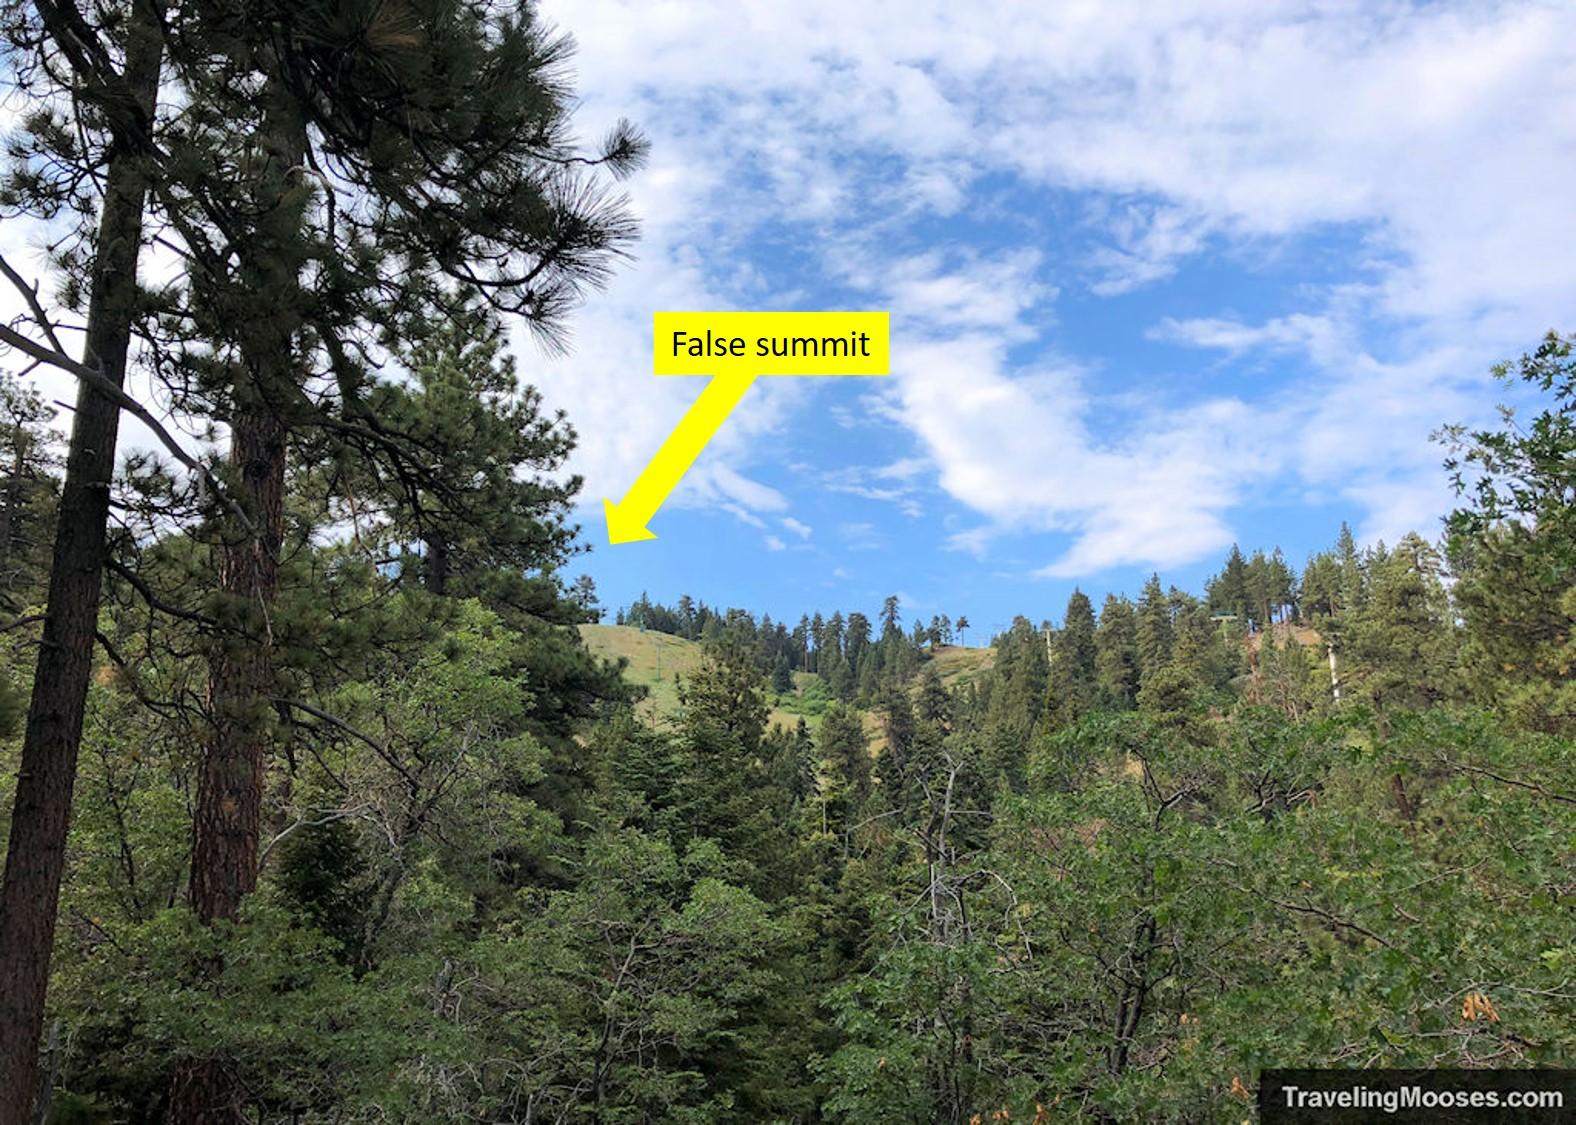 False summit of Bobsled hiking trail